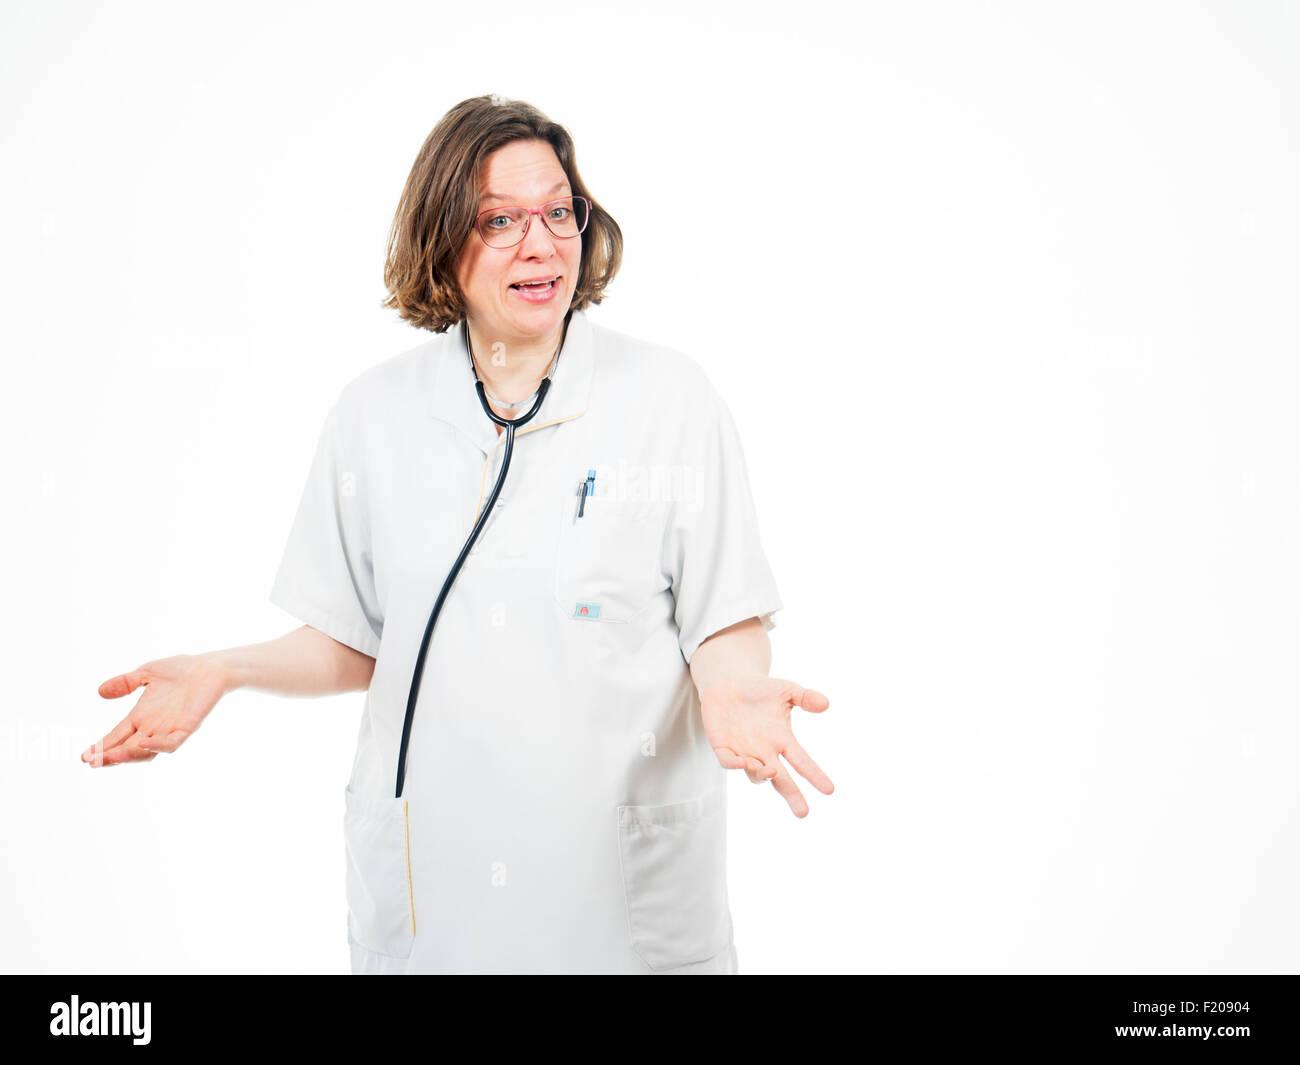 Krankenschwester-Abenteuer